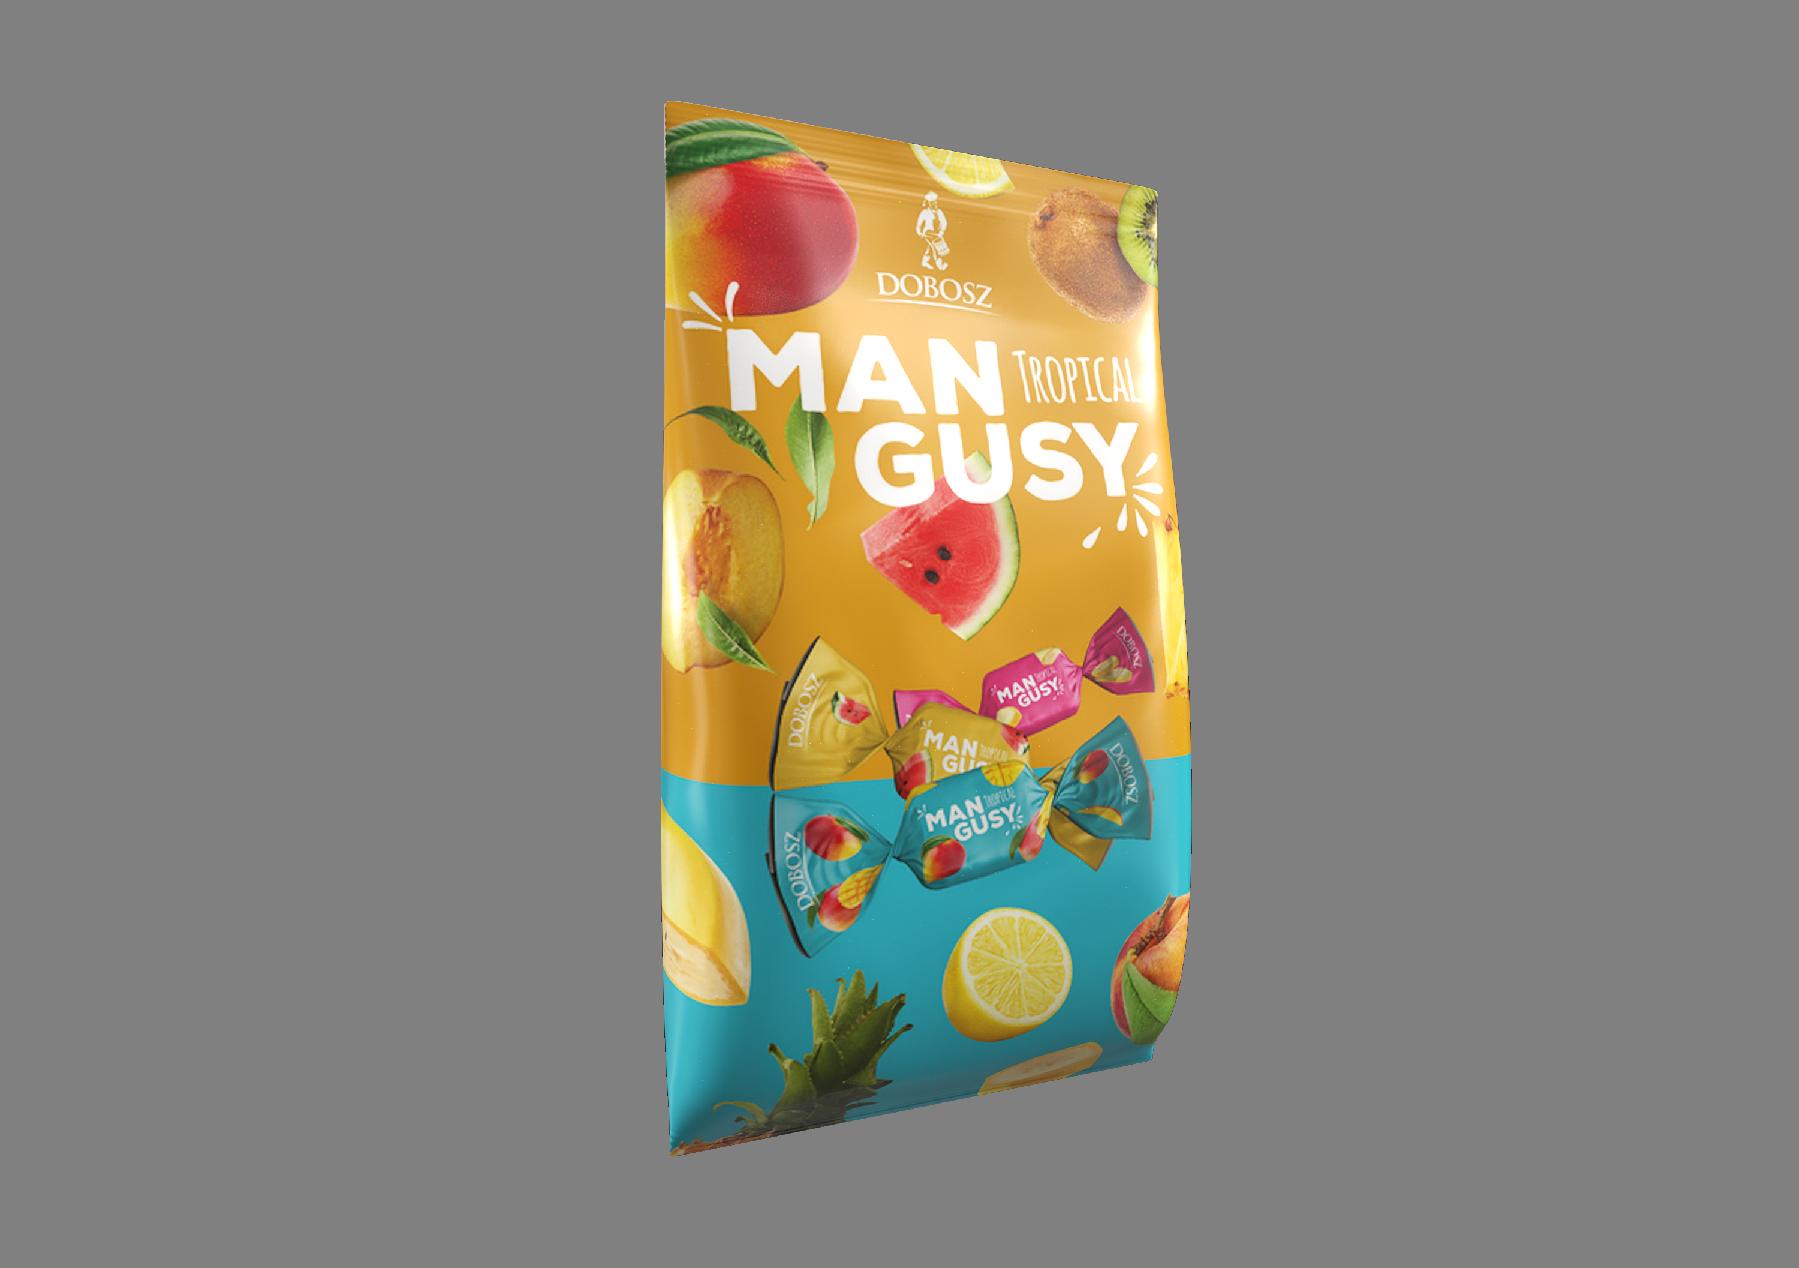 Mangusy